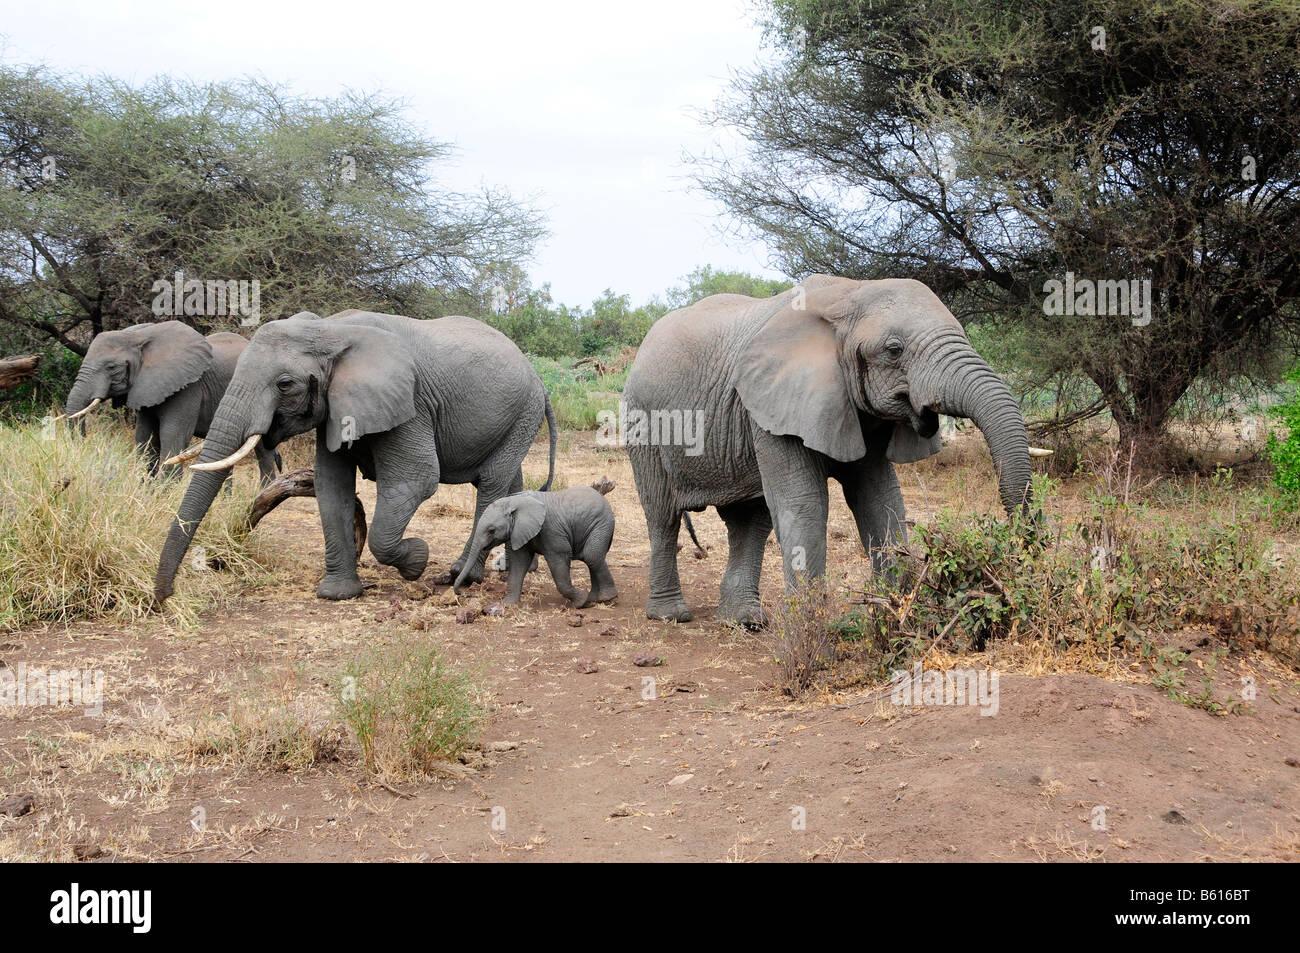 African Bush Elephants with young (Loxodonta africana), Lake Manyara National Park, Tanzania, Africa - Stock Image